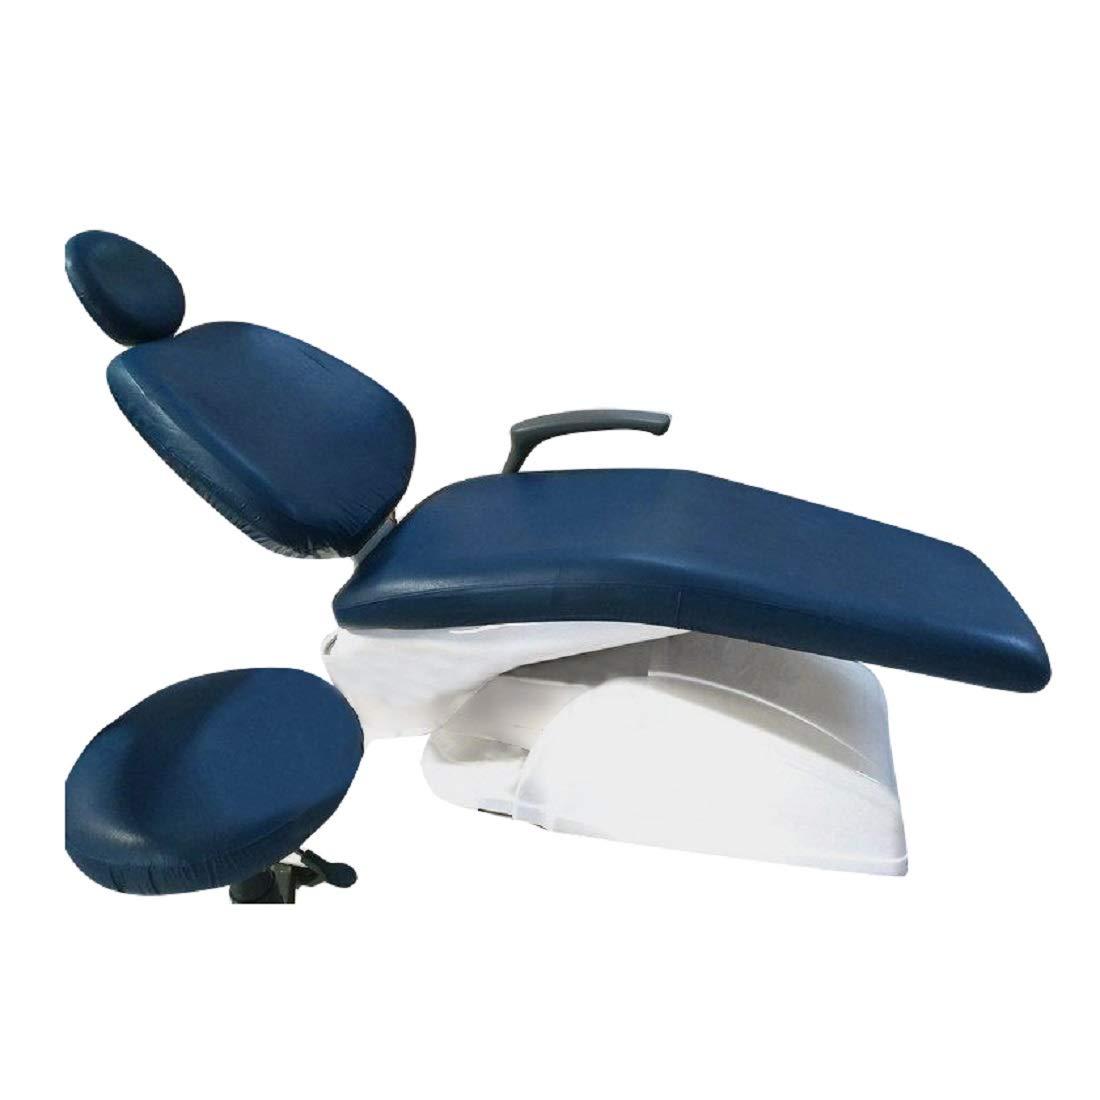 Tinsay 4pcs/Set Pure Colors Elastic Dental Chair Seat Cover Washable Protector Blue